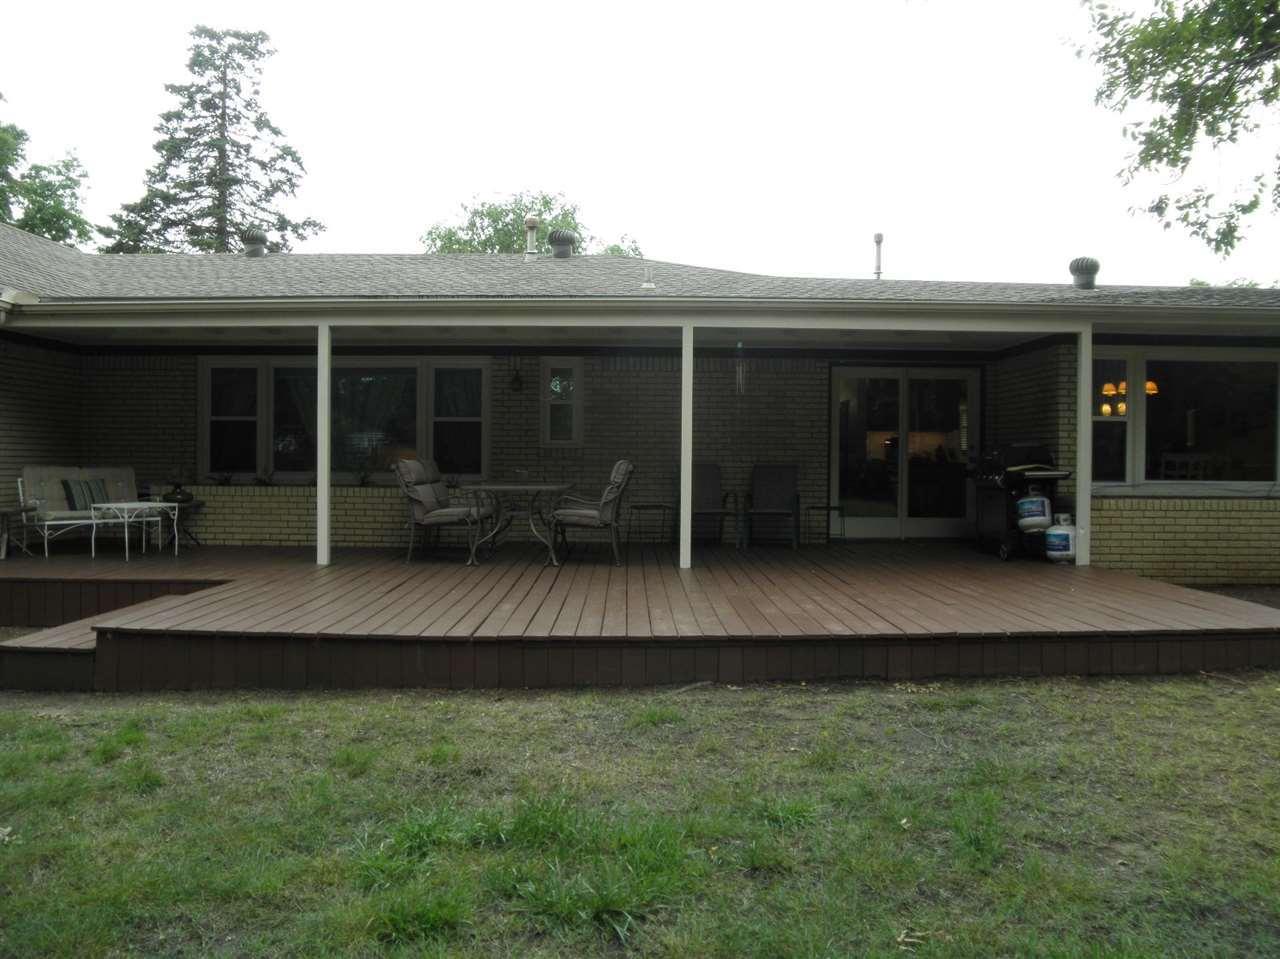 Sold Cross Sale W/ MLS | 127 Fairview  Ponca City, OK 74601 31